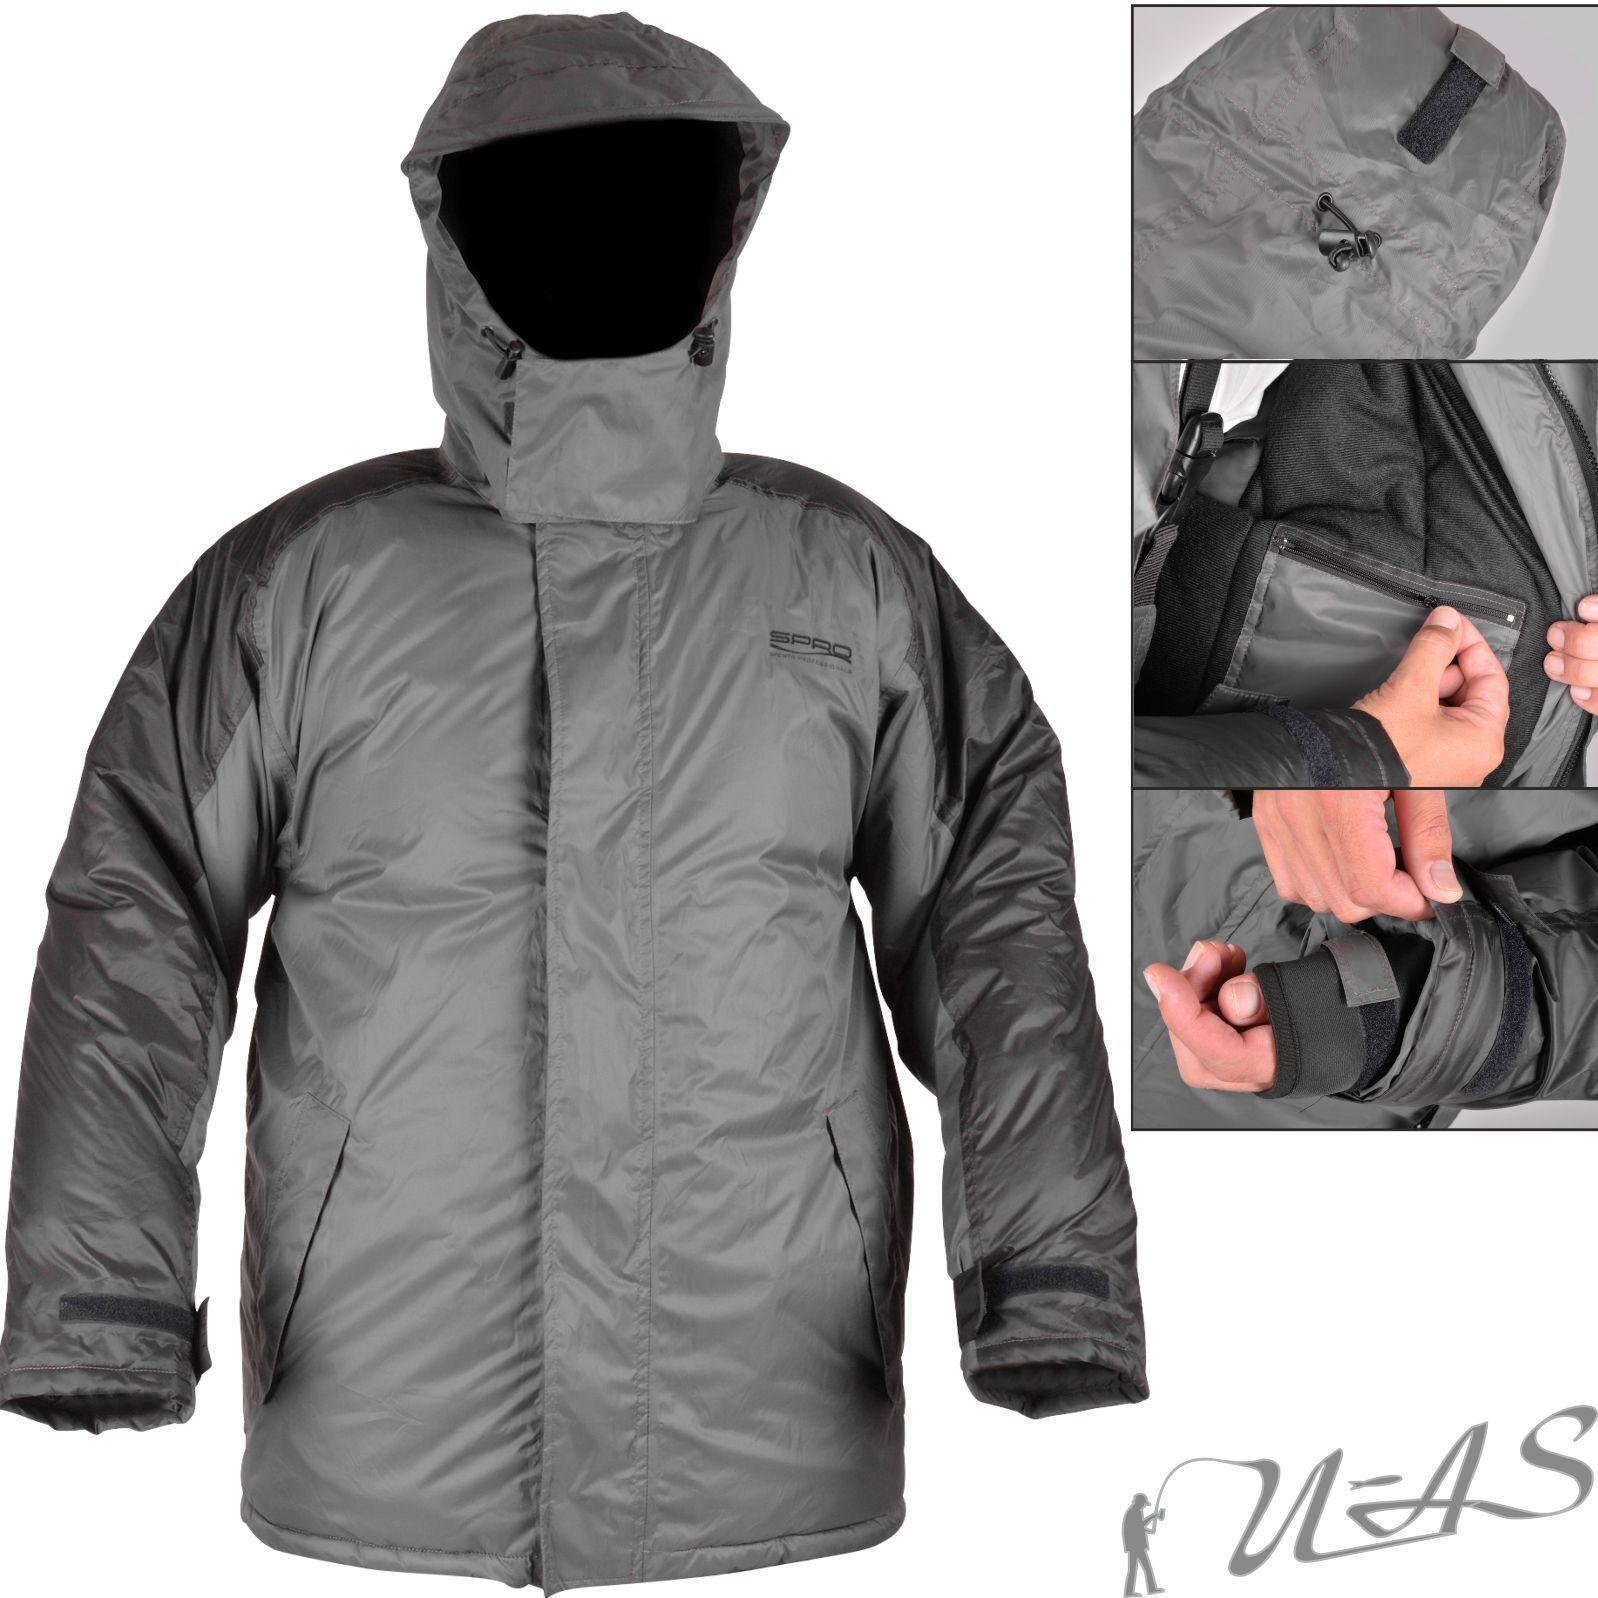 Spro Thermal Jacket Gr. M Zu Thermoanzug Thermal Suits Angelanzug Regenanzug Kva